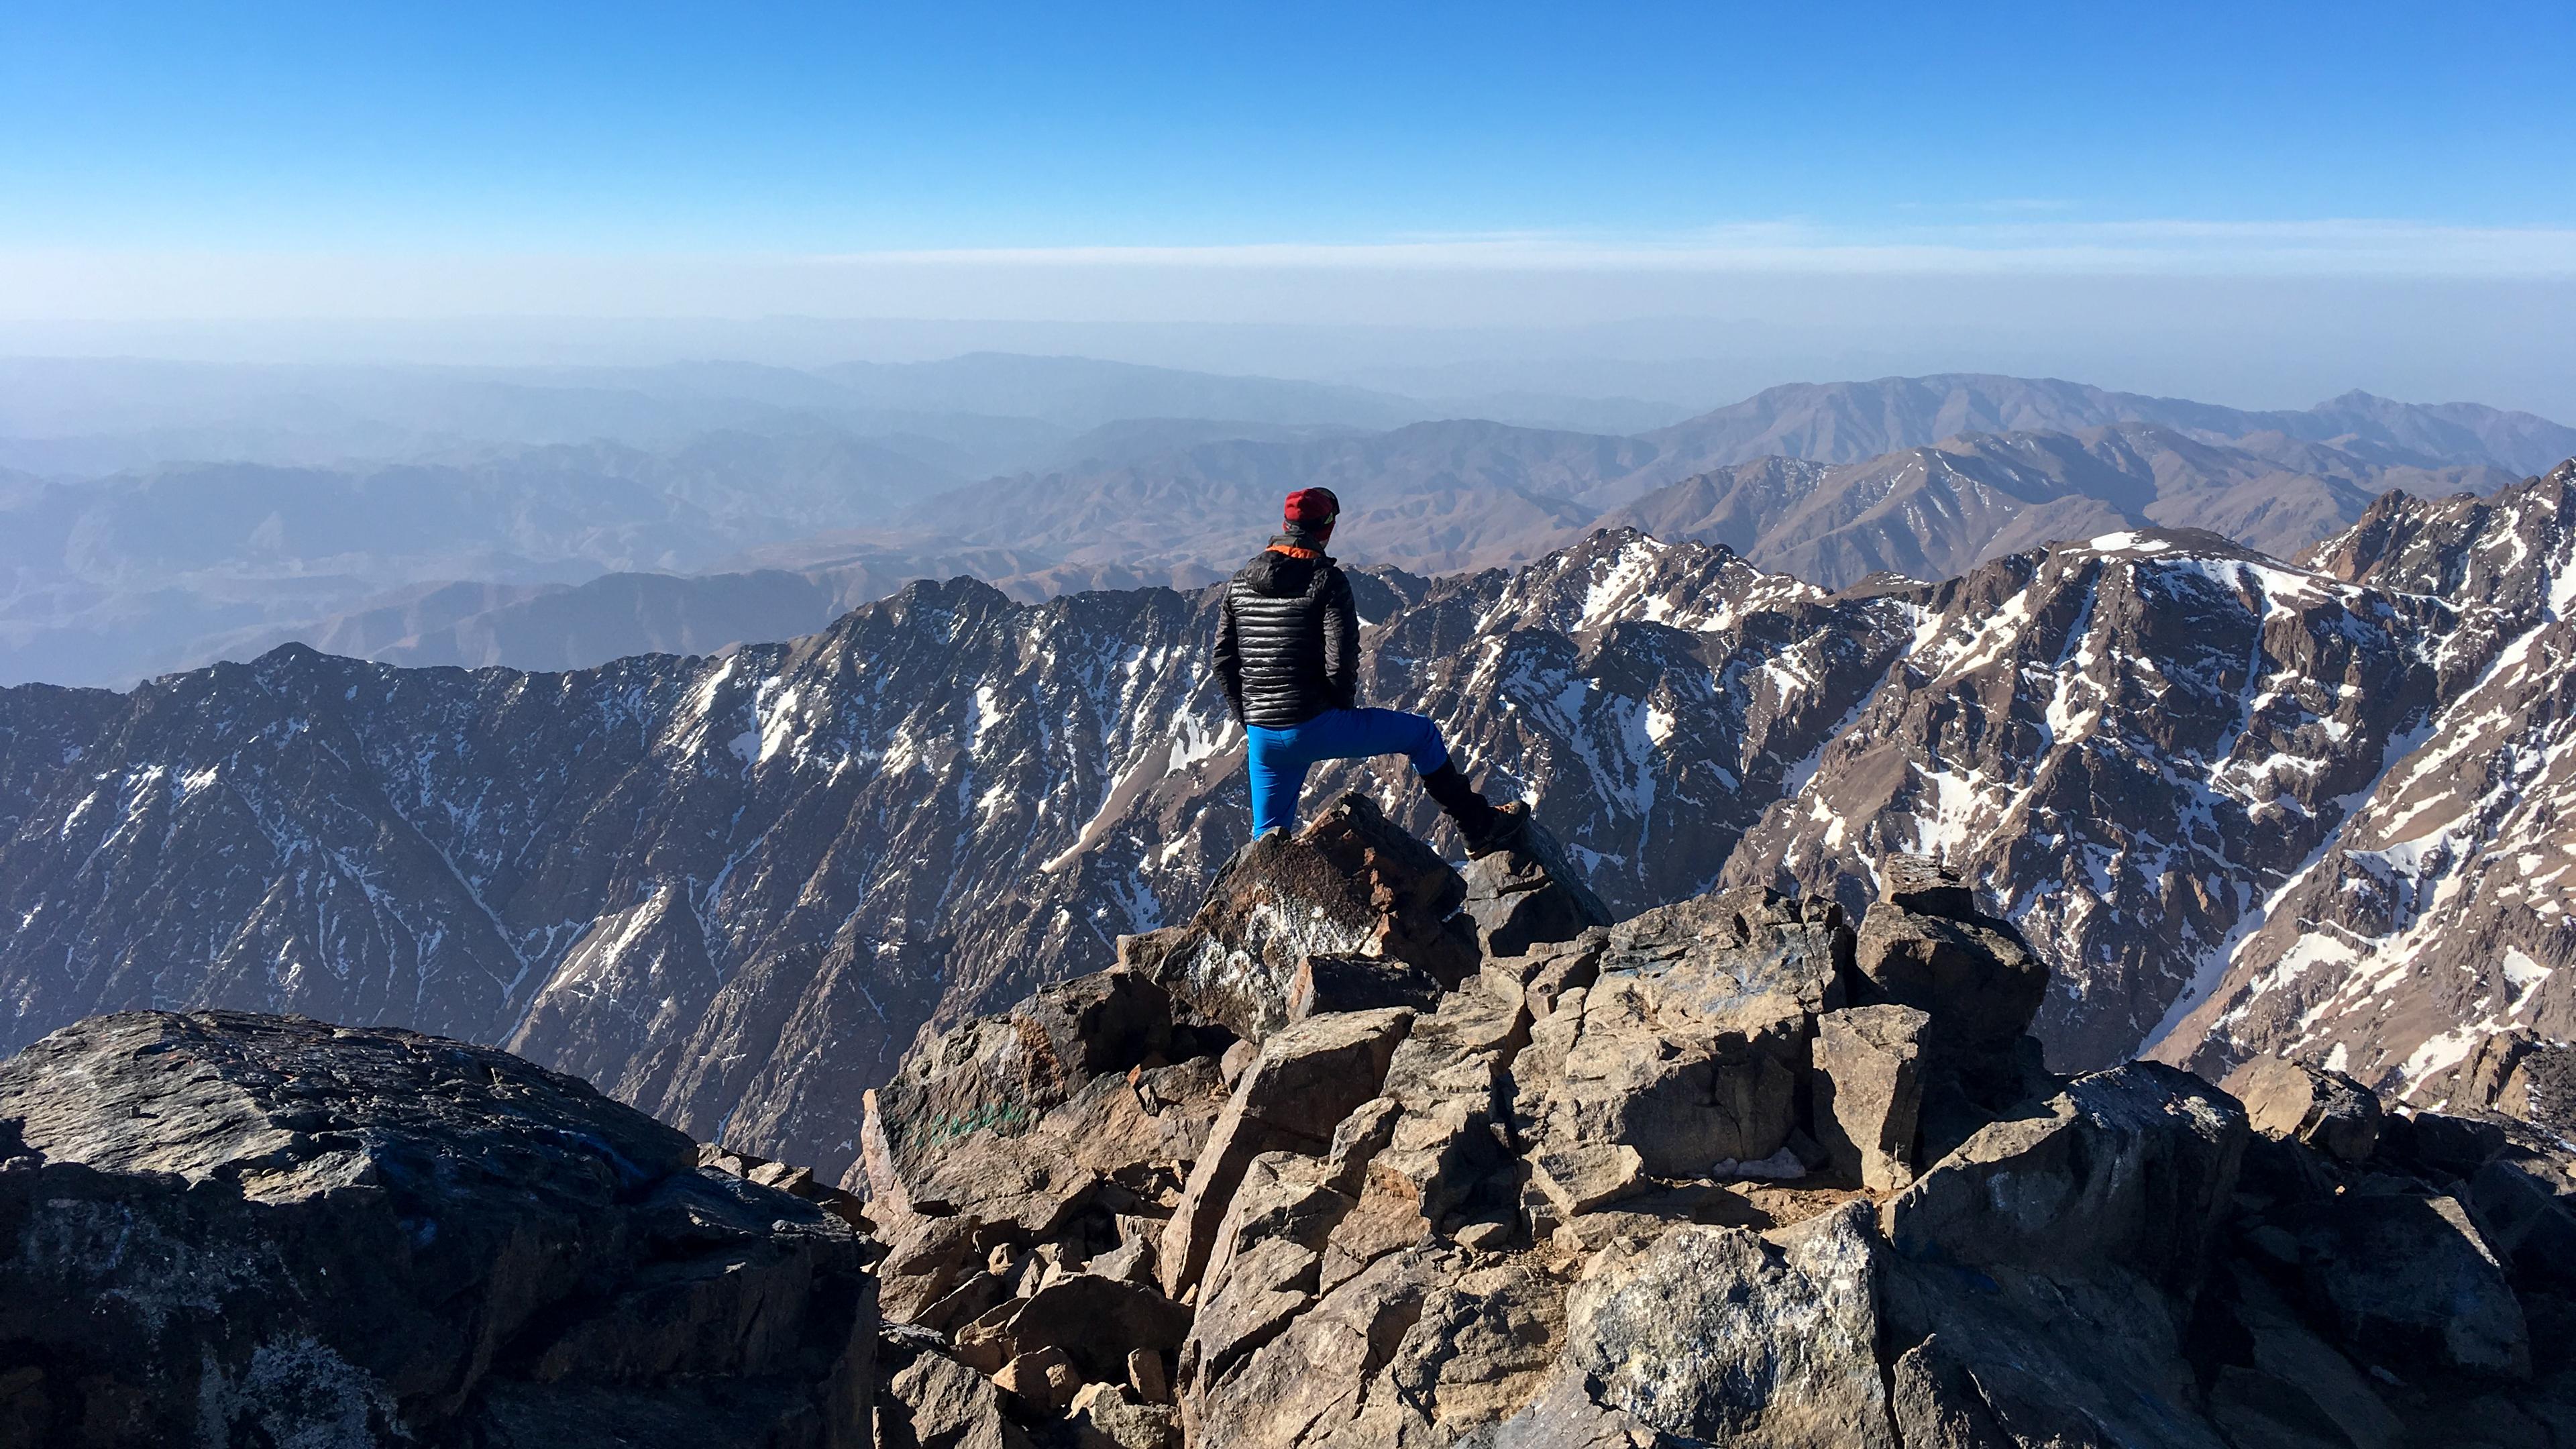 Widok ze szczytu Jebel Toubkal